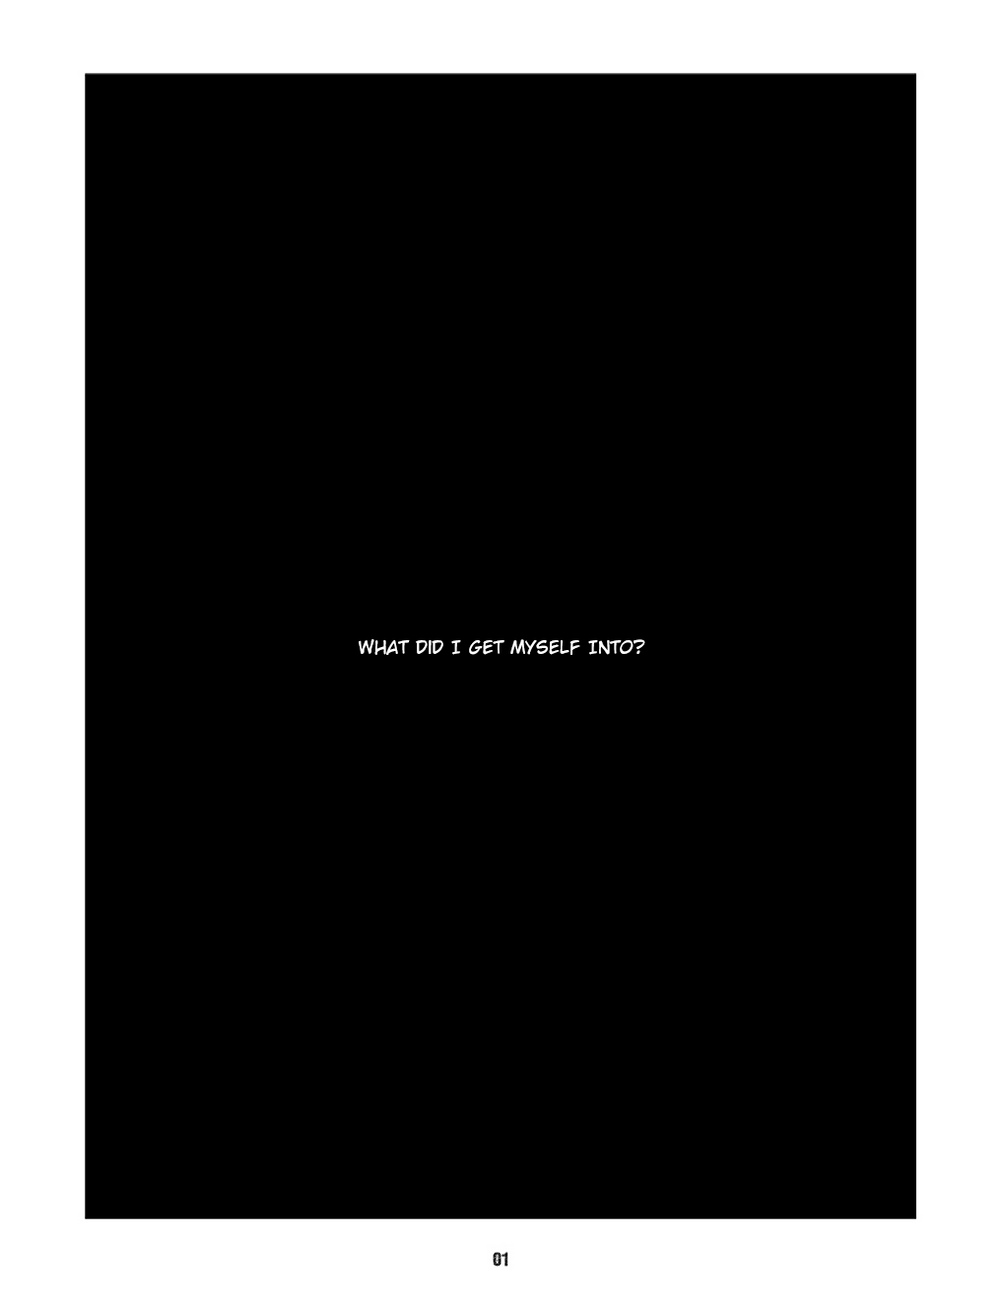 Safeword 2 free sex comic